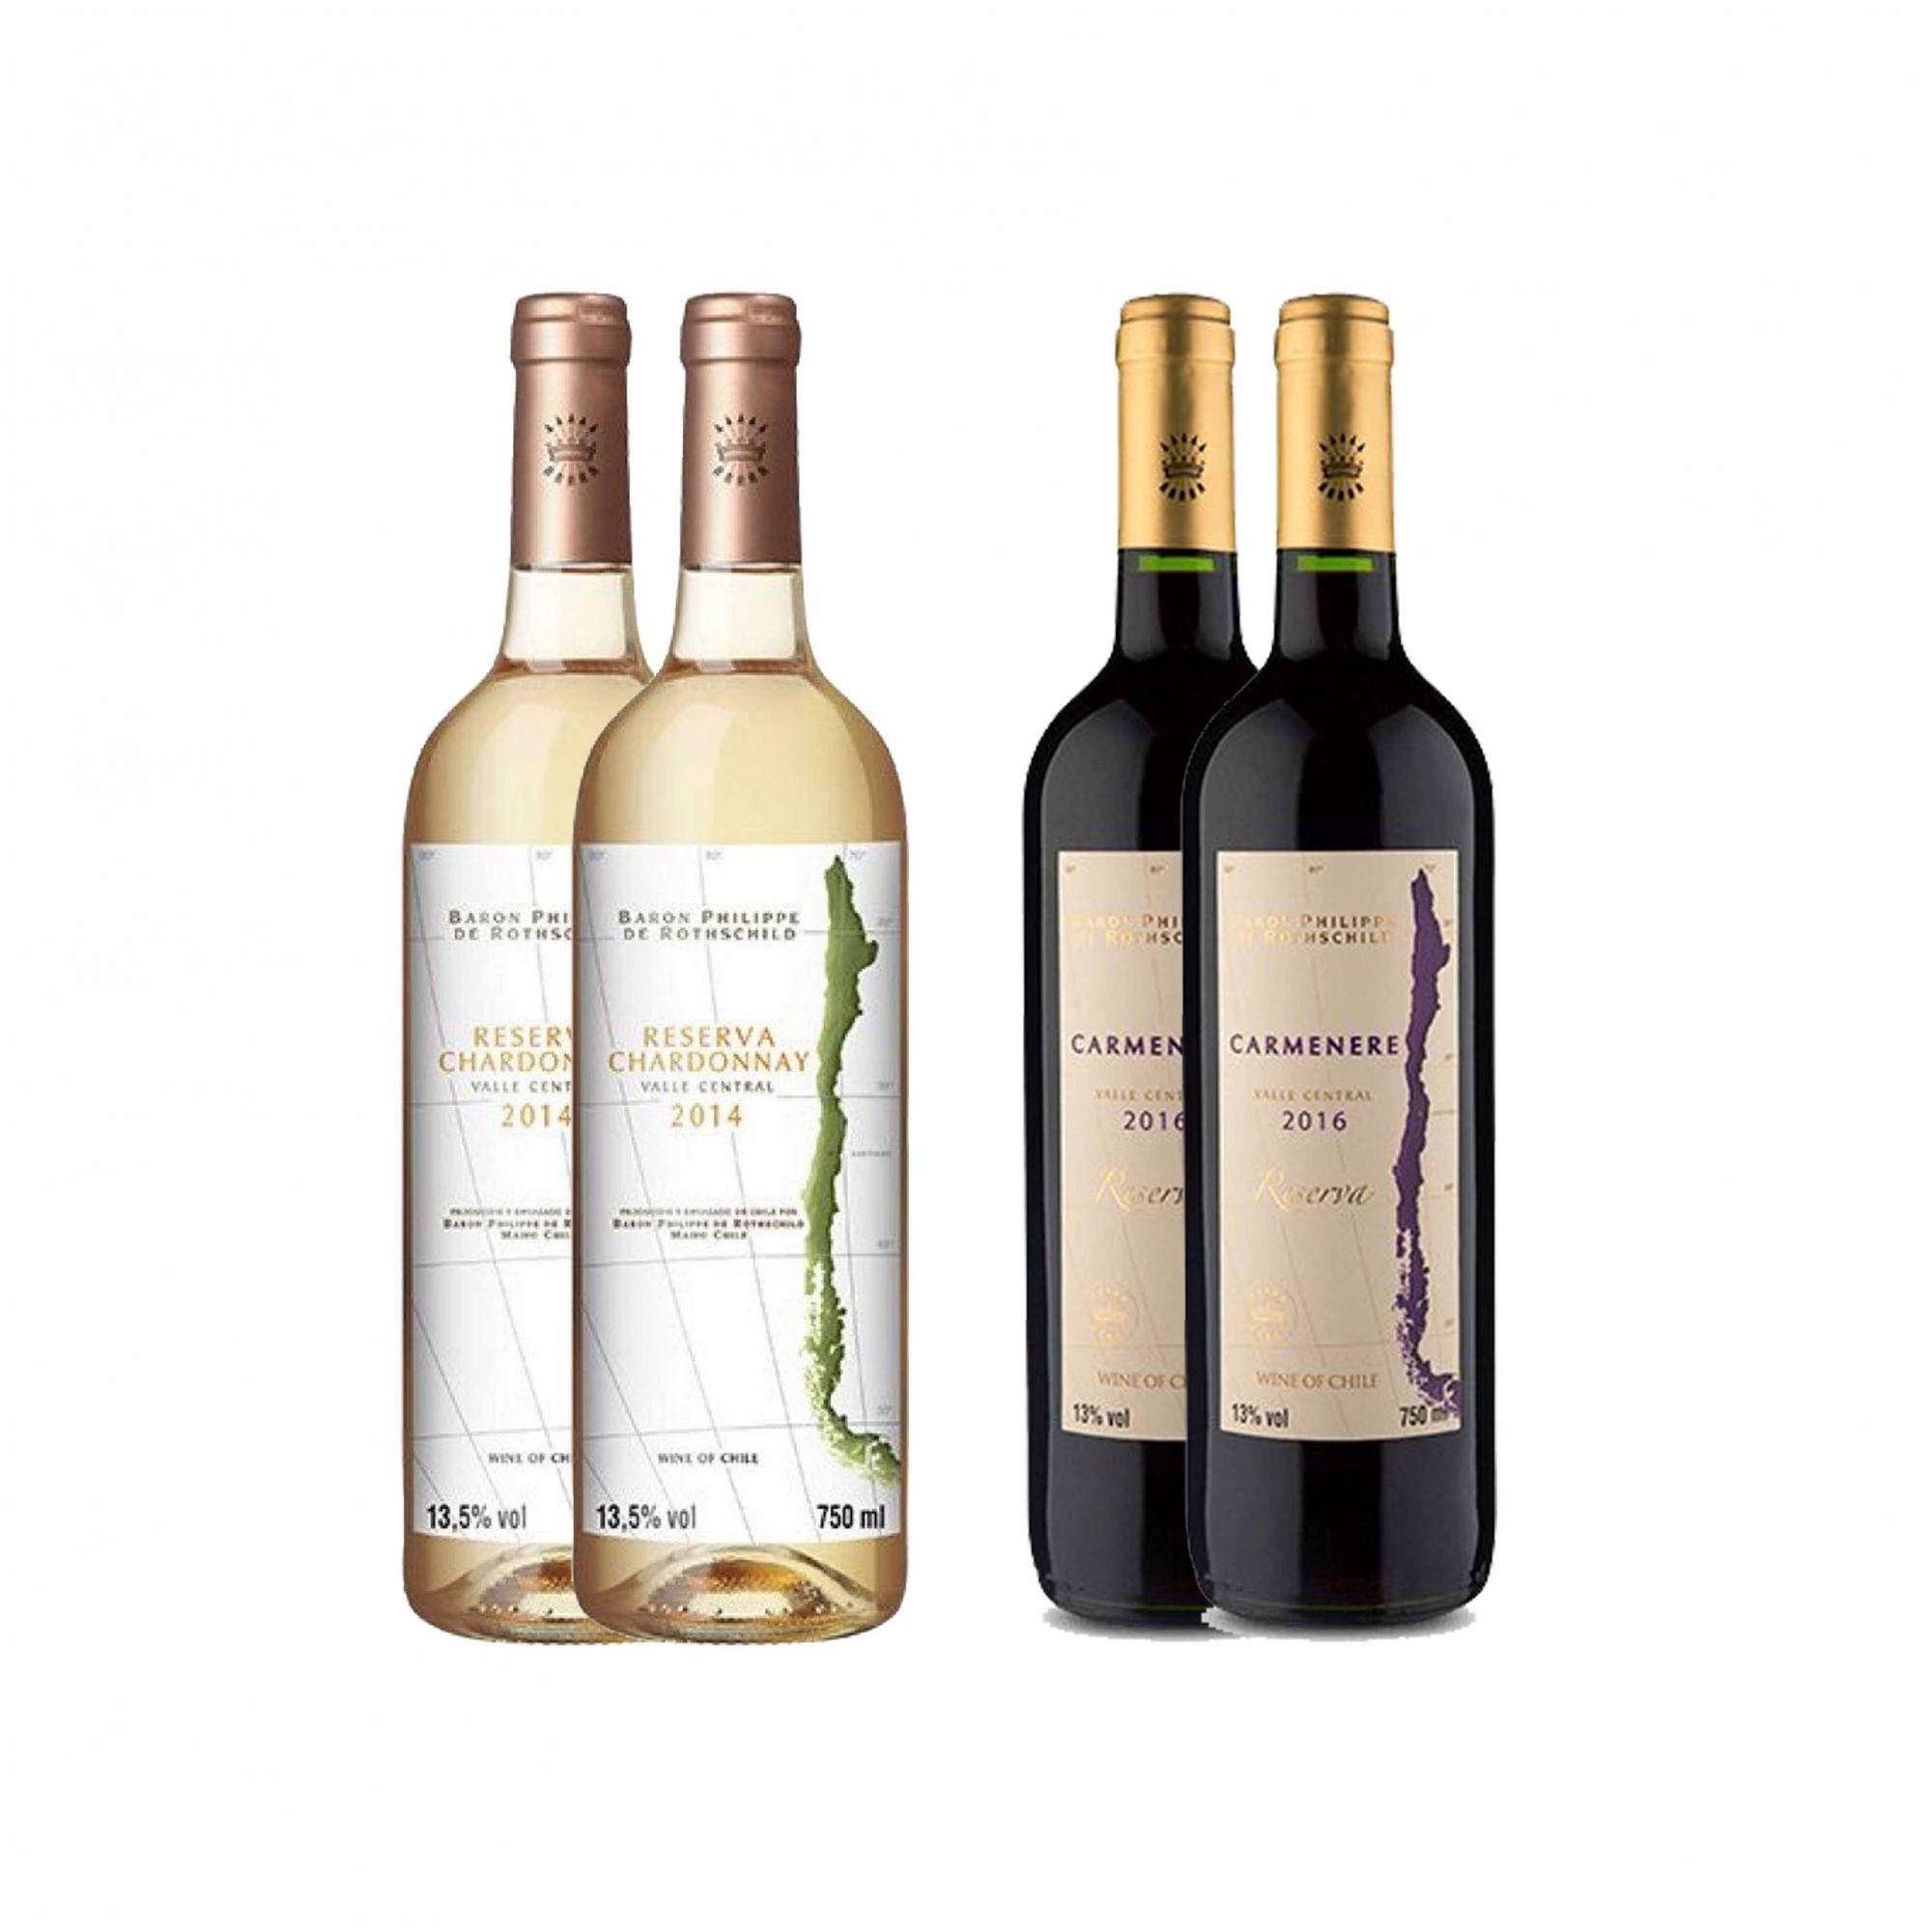 Kit 4x Vinho Branco/Tinto Chileno Baron Philippe de Rothschild Chardonnay/Carmenere 750ml